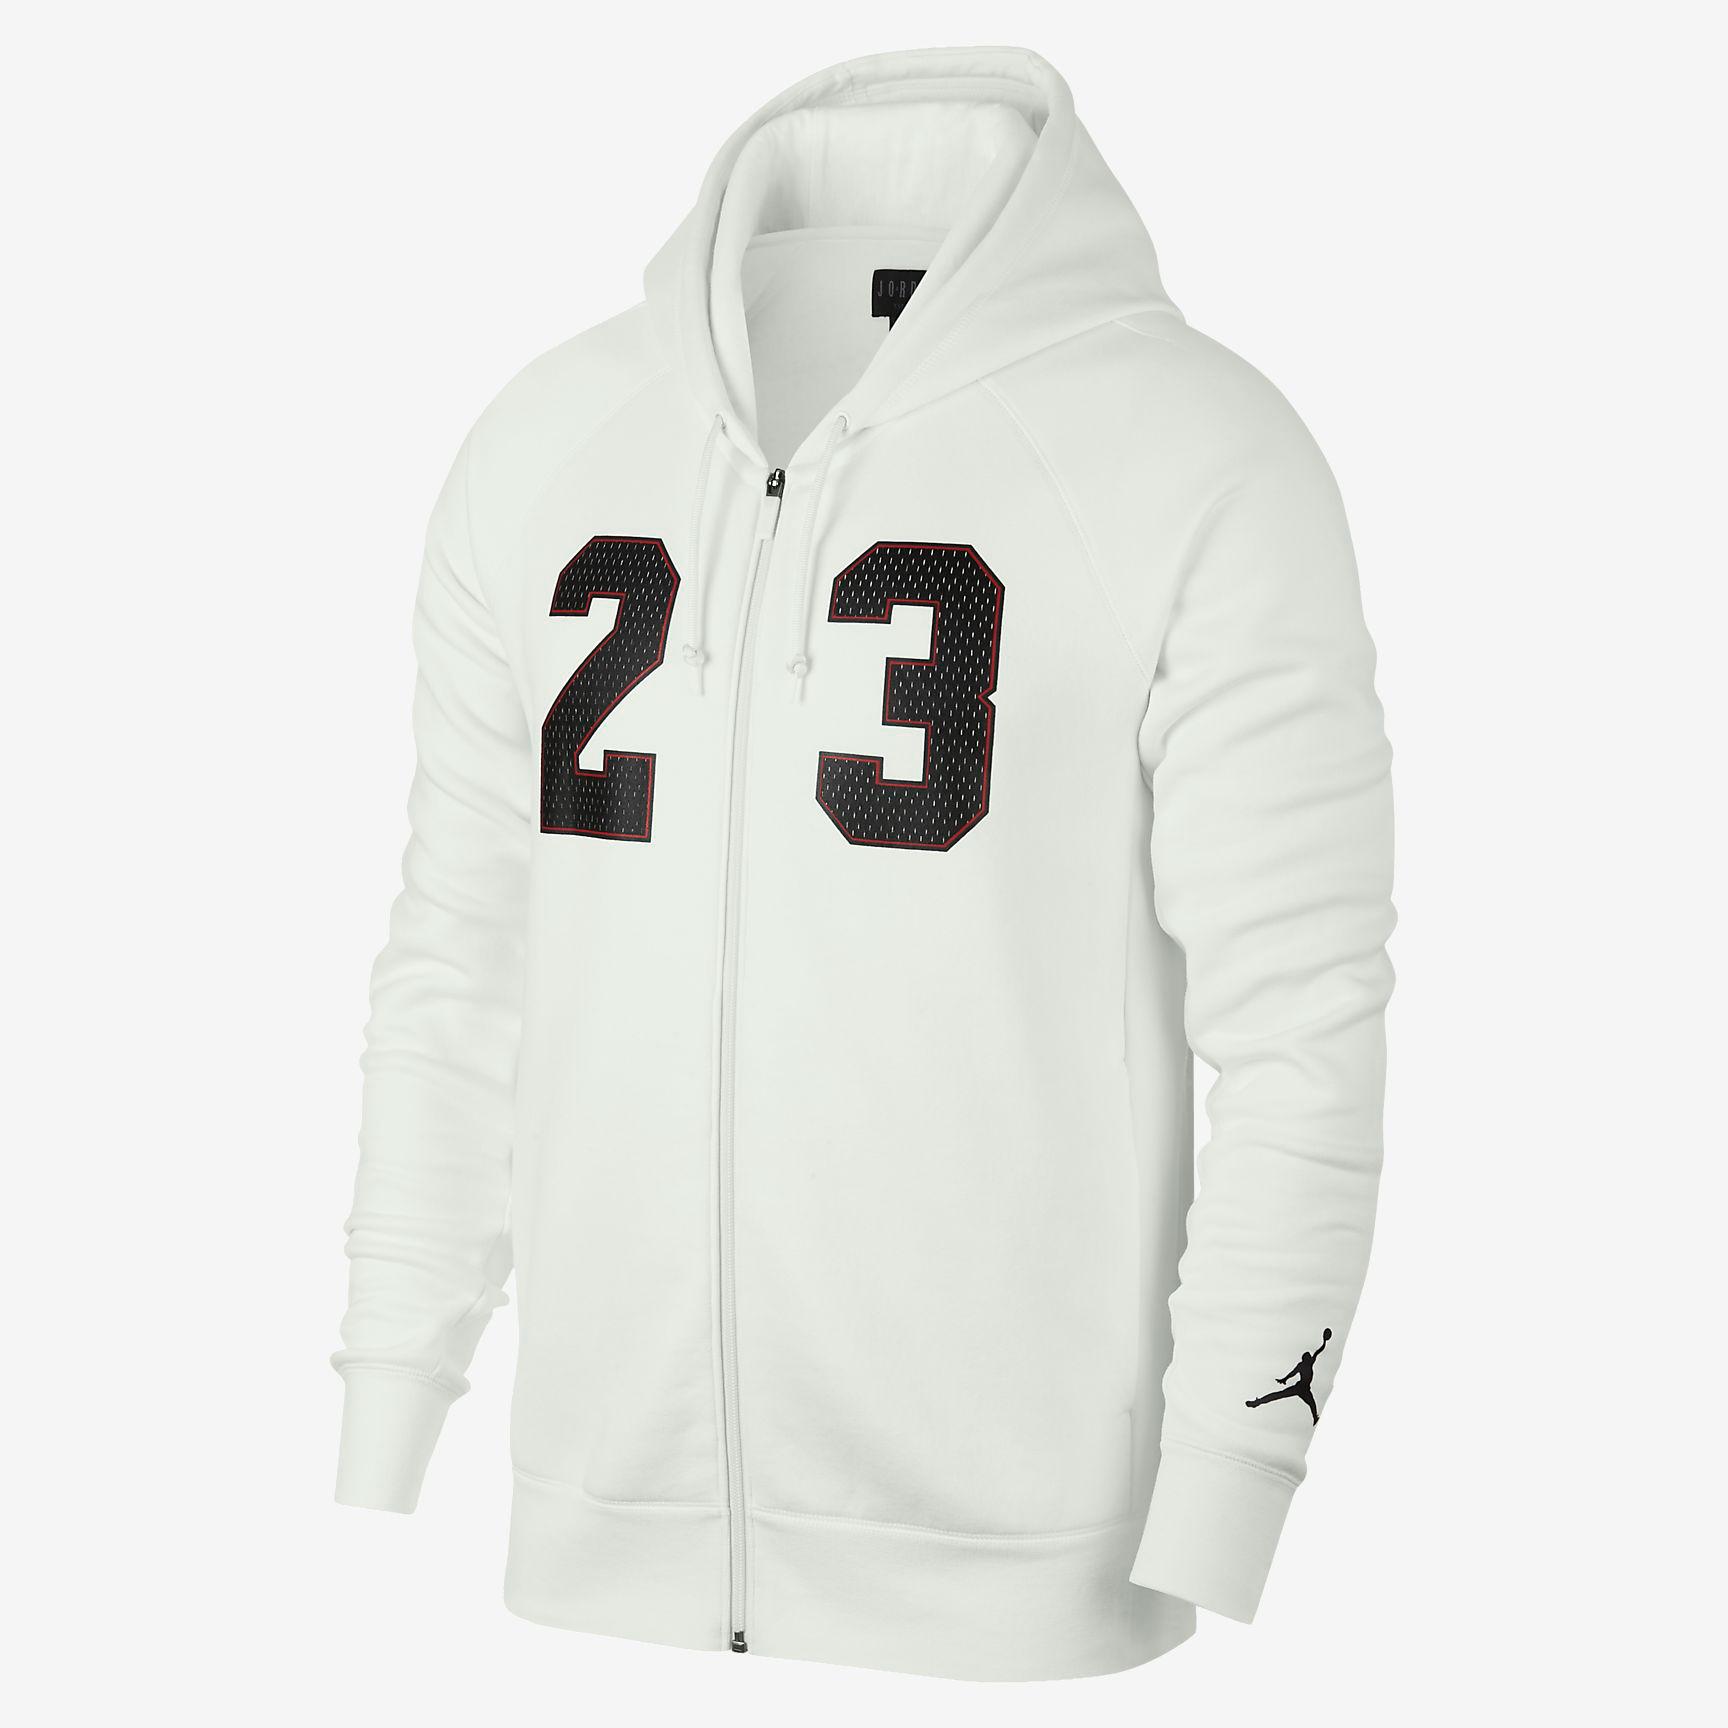 jordan-10-im-back-white-black-hoodie-1